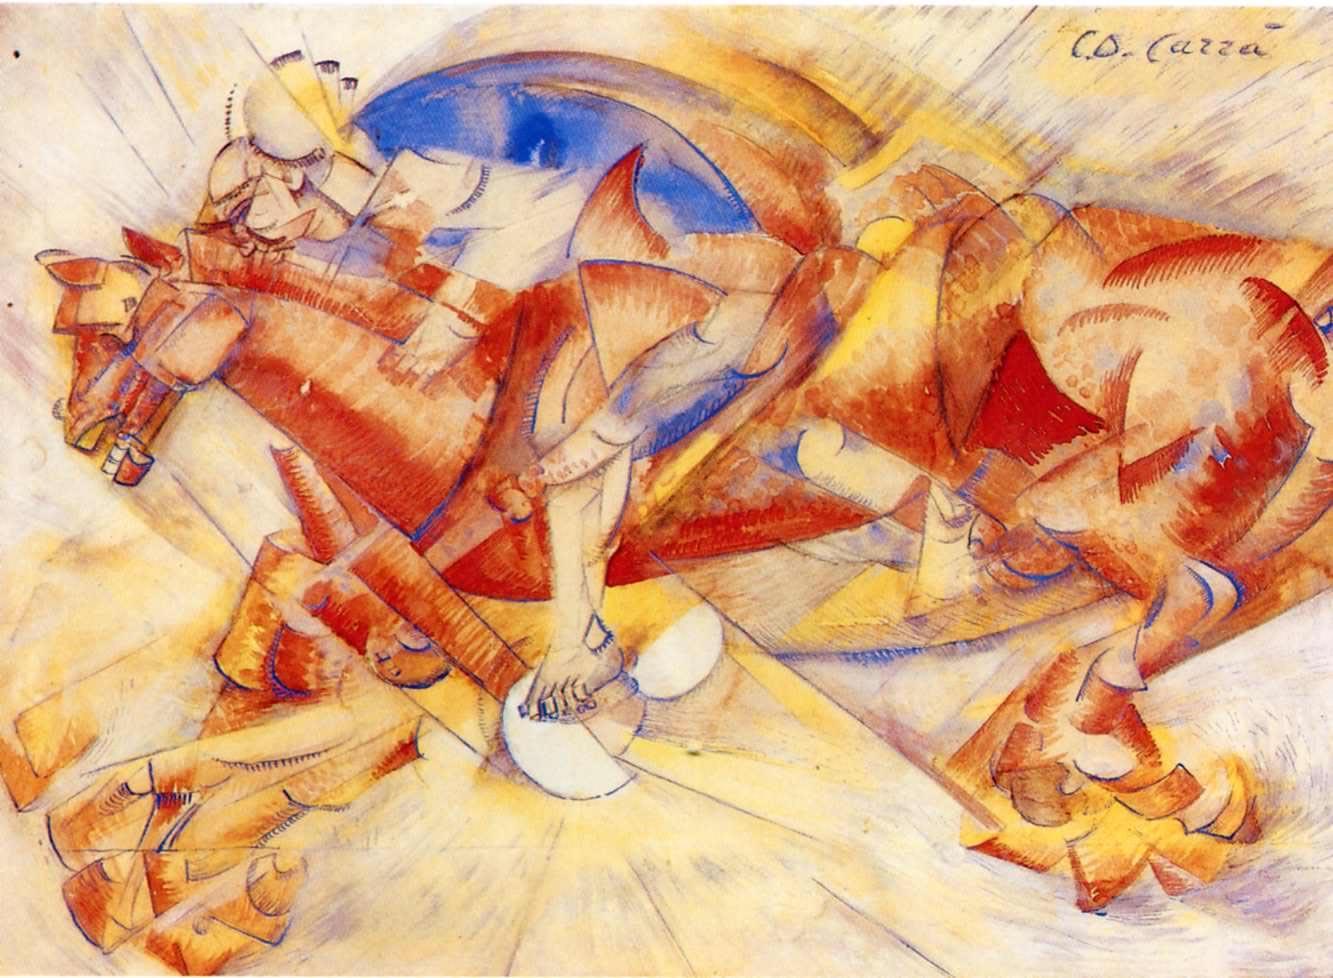 Carlo Carrà  The Red Horseman, 1913  Oil on Canvas, 26 x 36 cm Civico Museo d'Arte Contemporanea, Milan